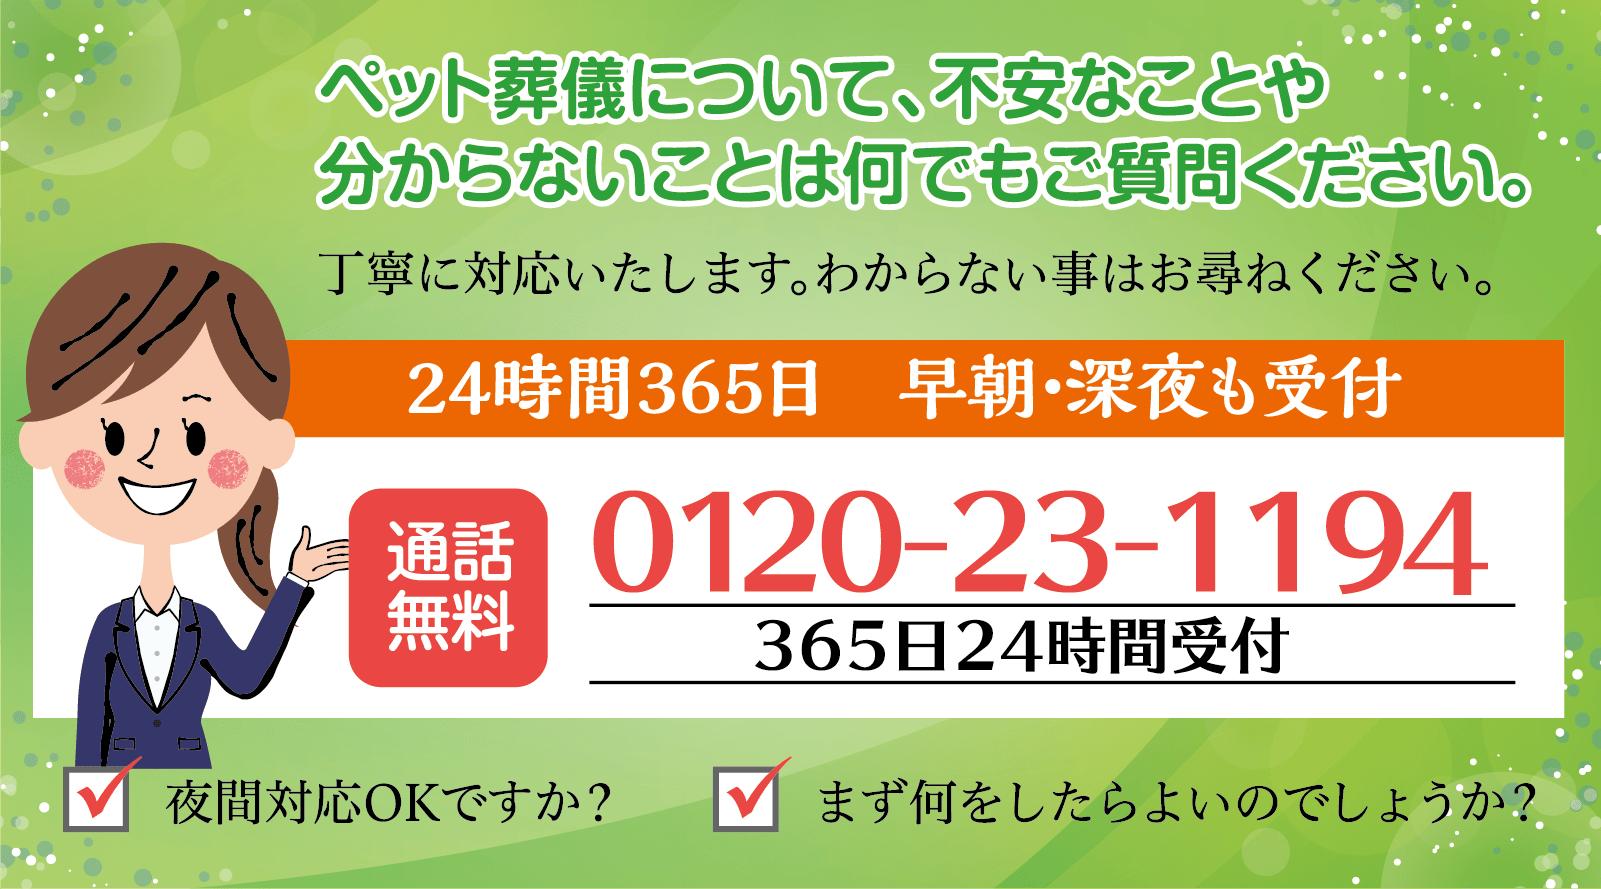 0120-23-1194